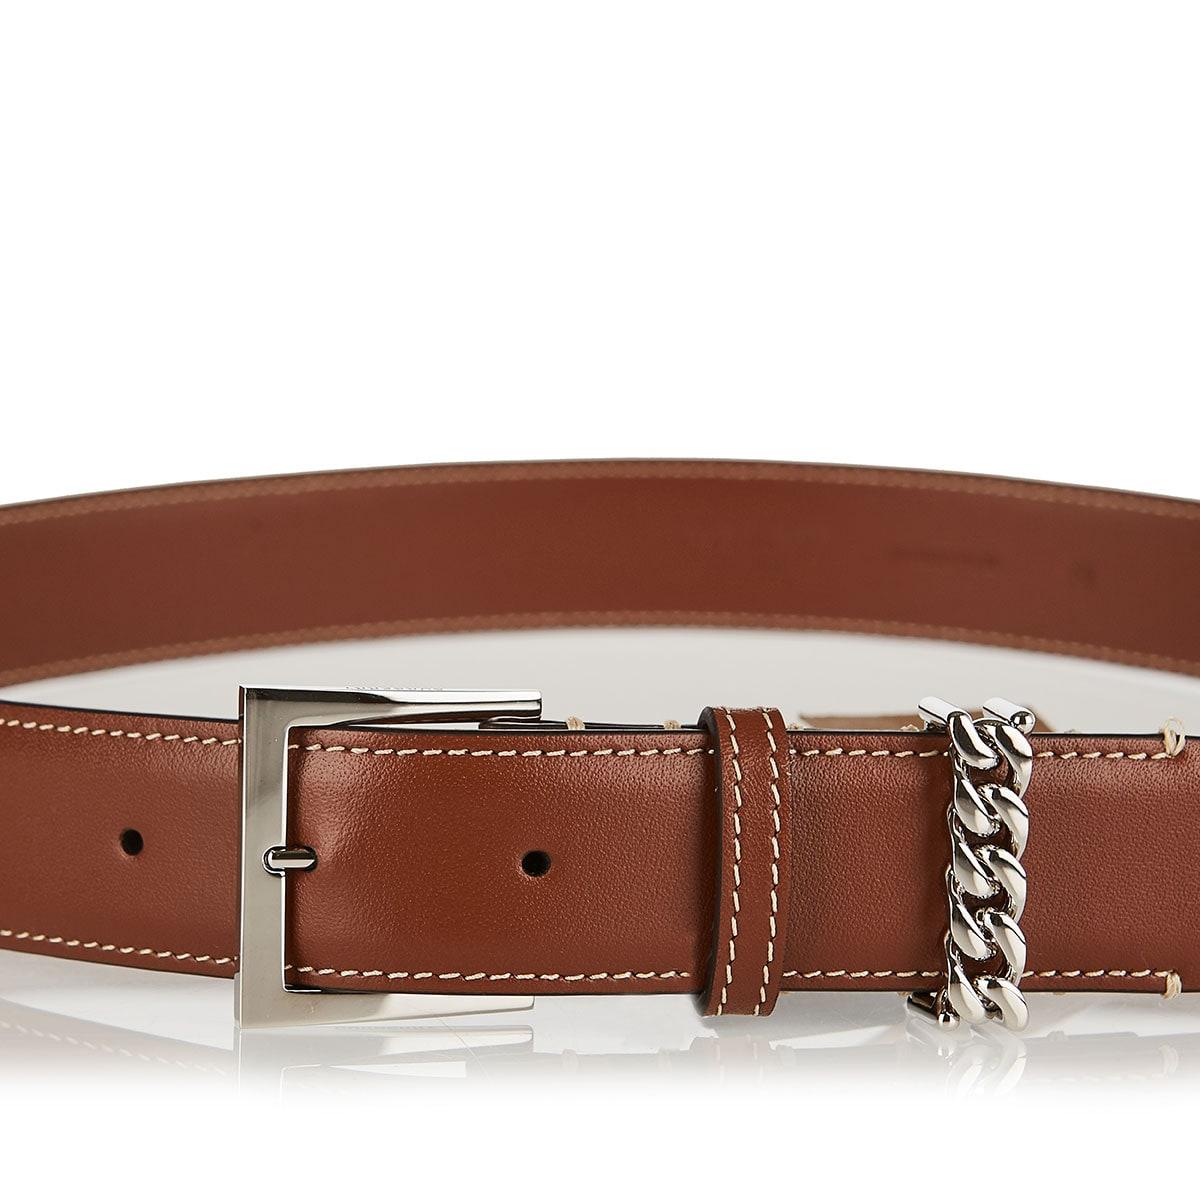 Chain-embellished leather belt